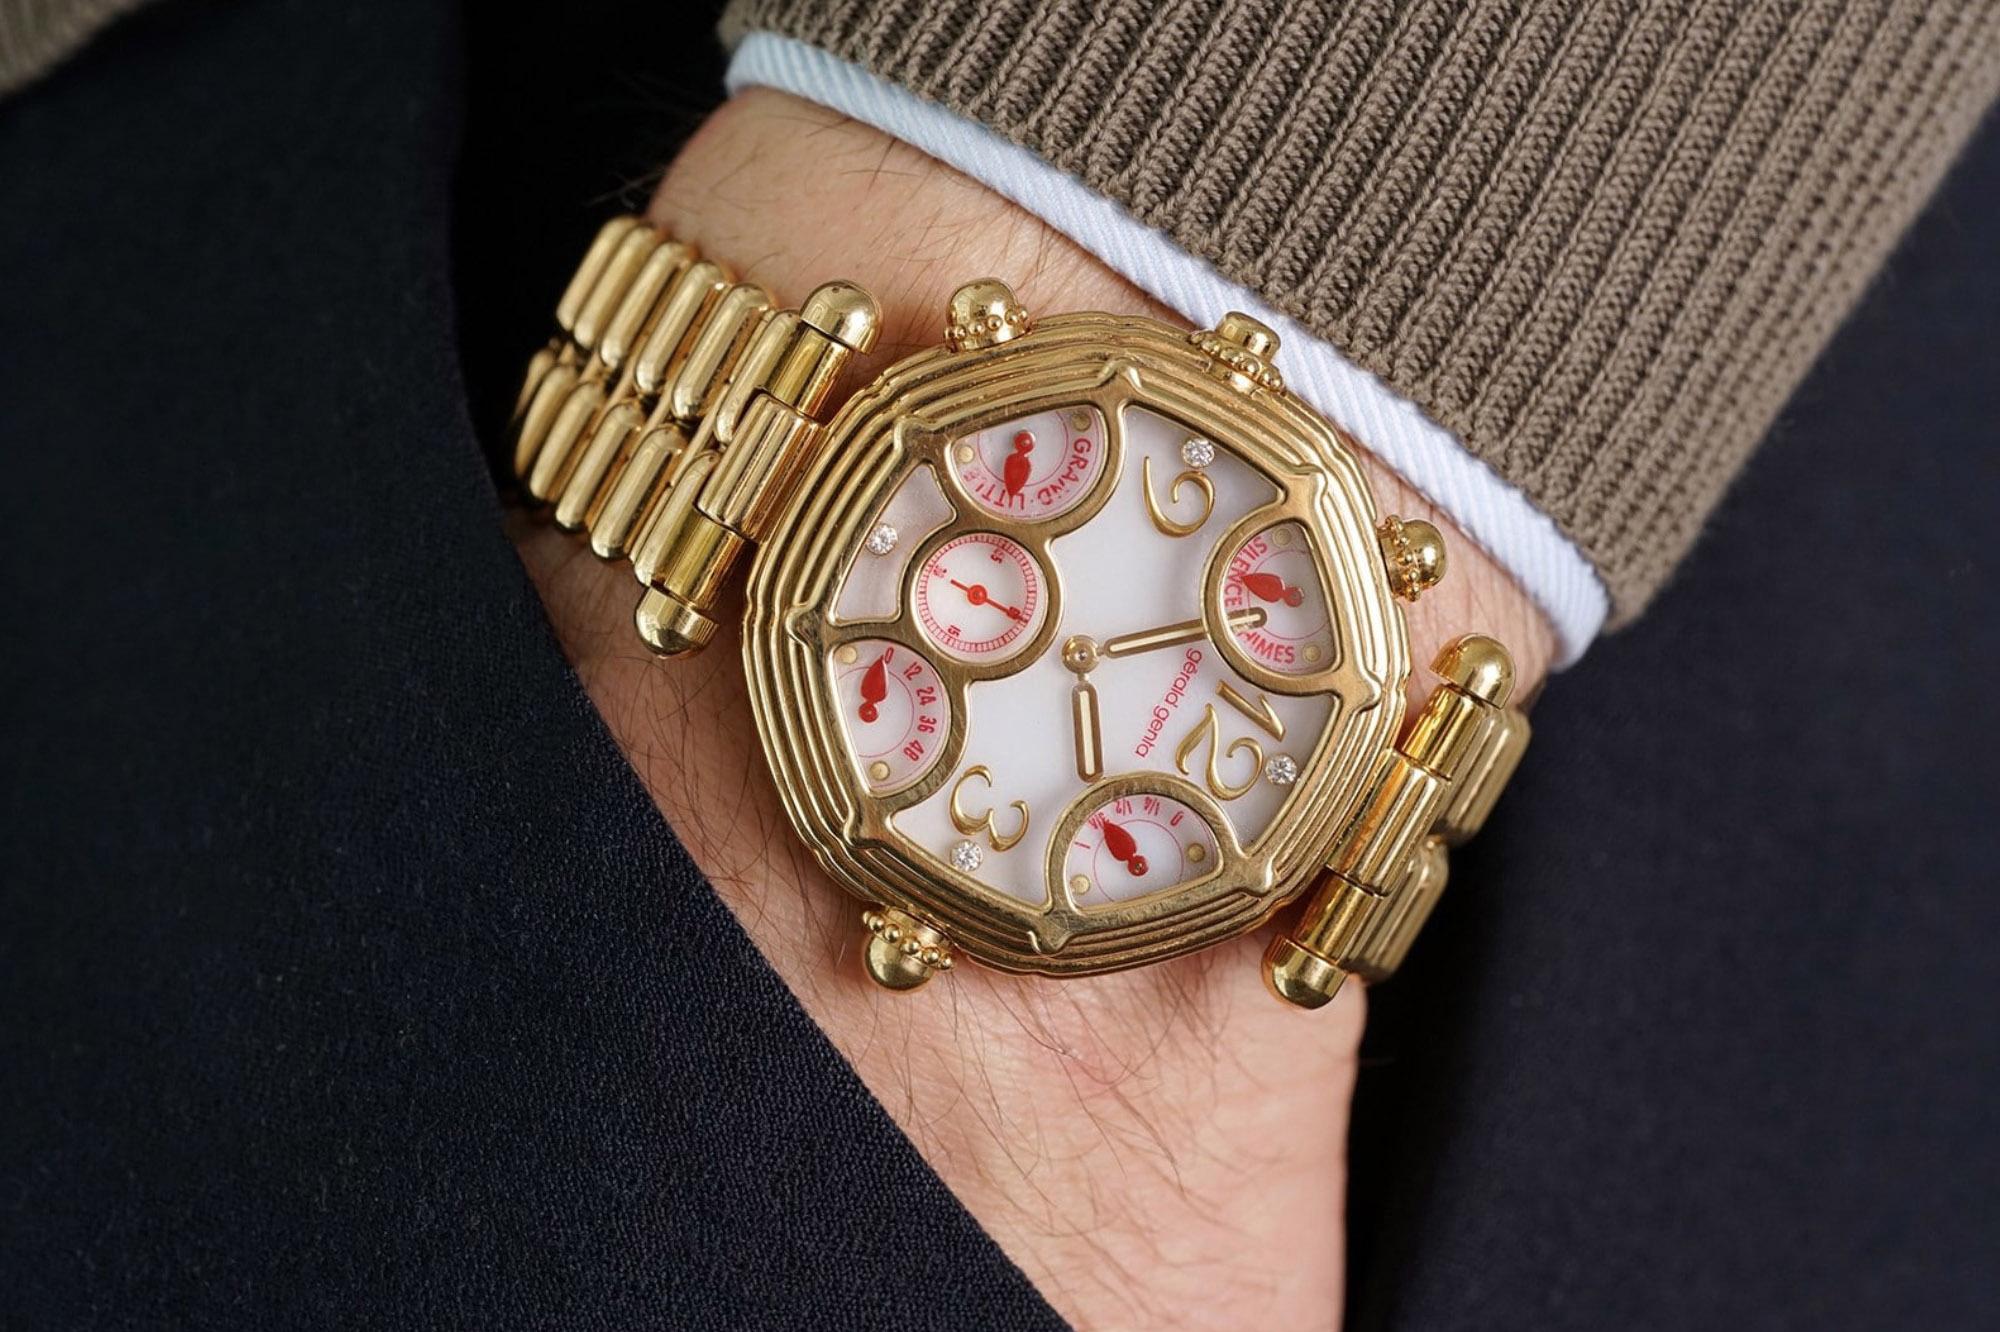 Gerald Genta Grande et Petite Sonnerie wristshot